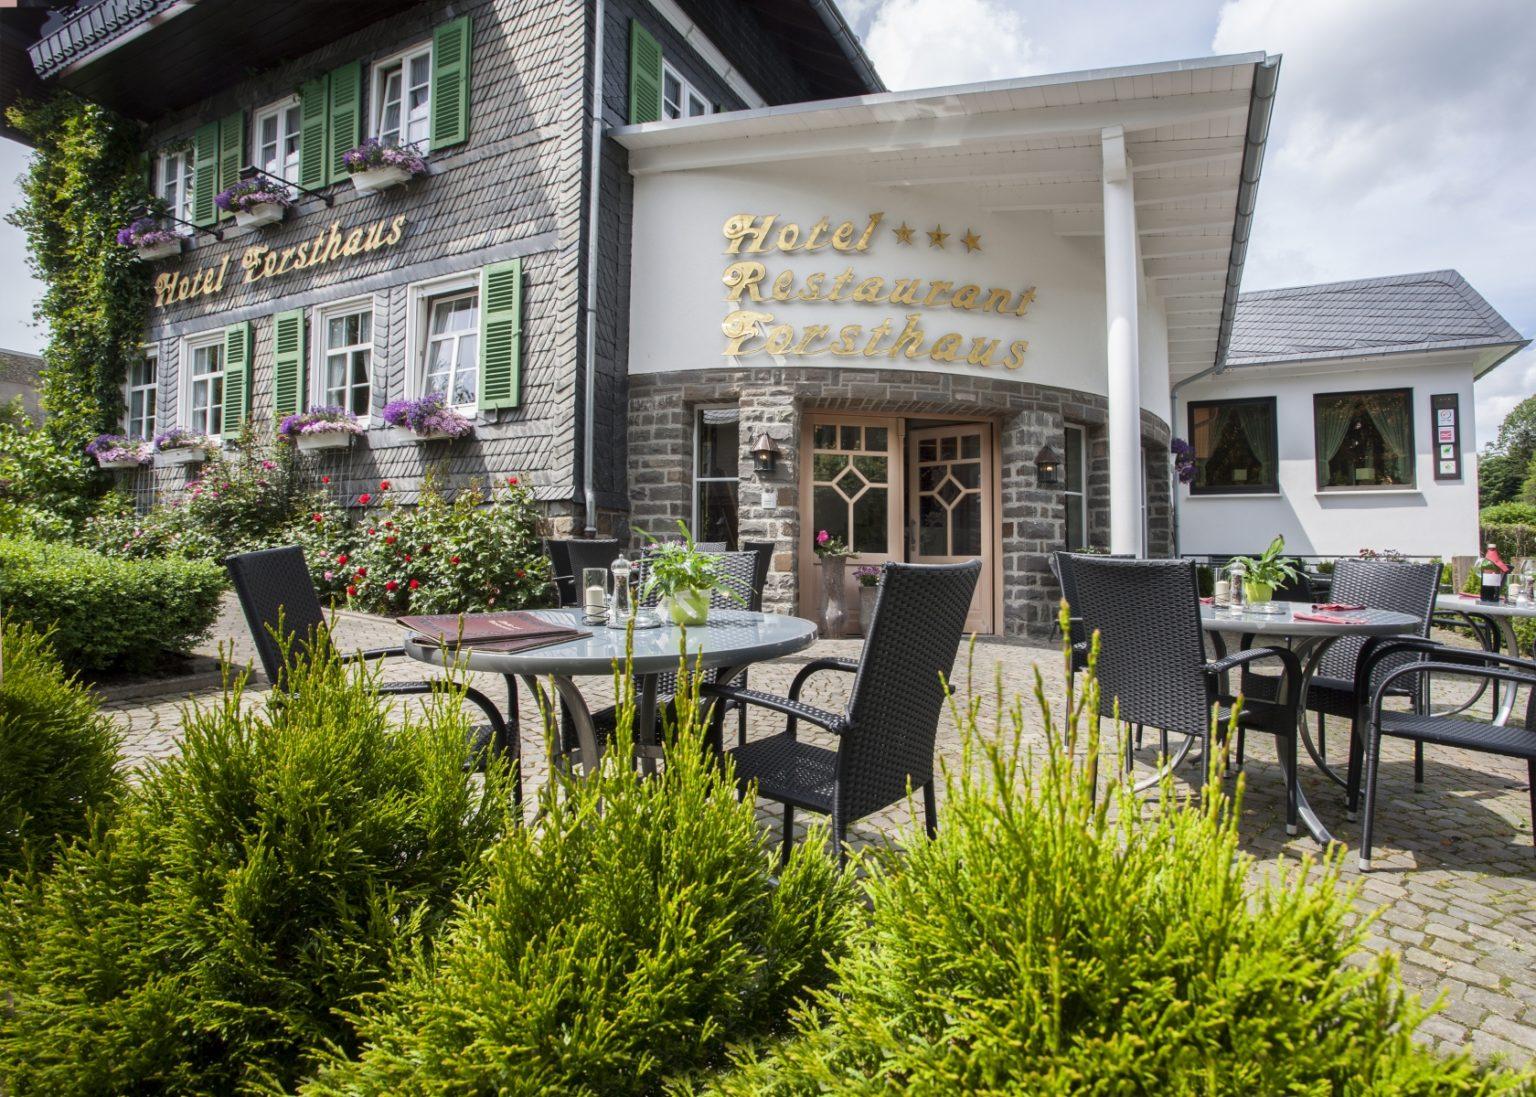 Hotel Forsthaus Winterberg